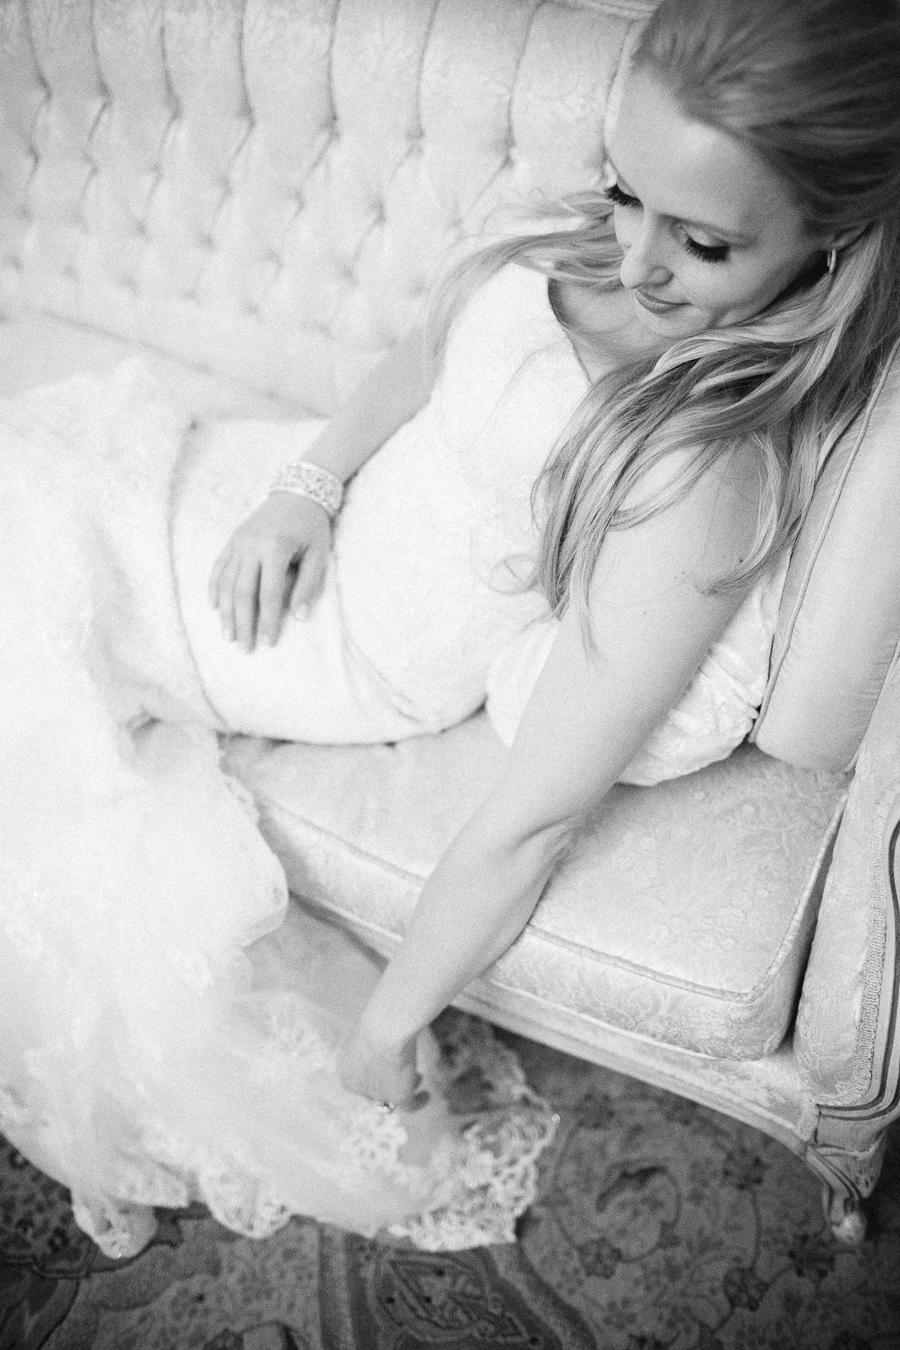 french wedding, elegant wedding, fine art wedding, fine art wedding photographer, california fine art wedding photographer, twin oaks house wedding, twin oaks house san marcos wedding, french bride